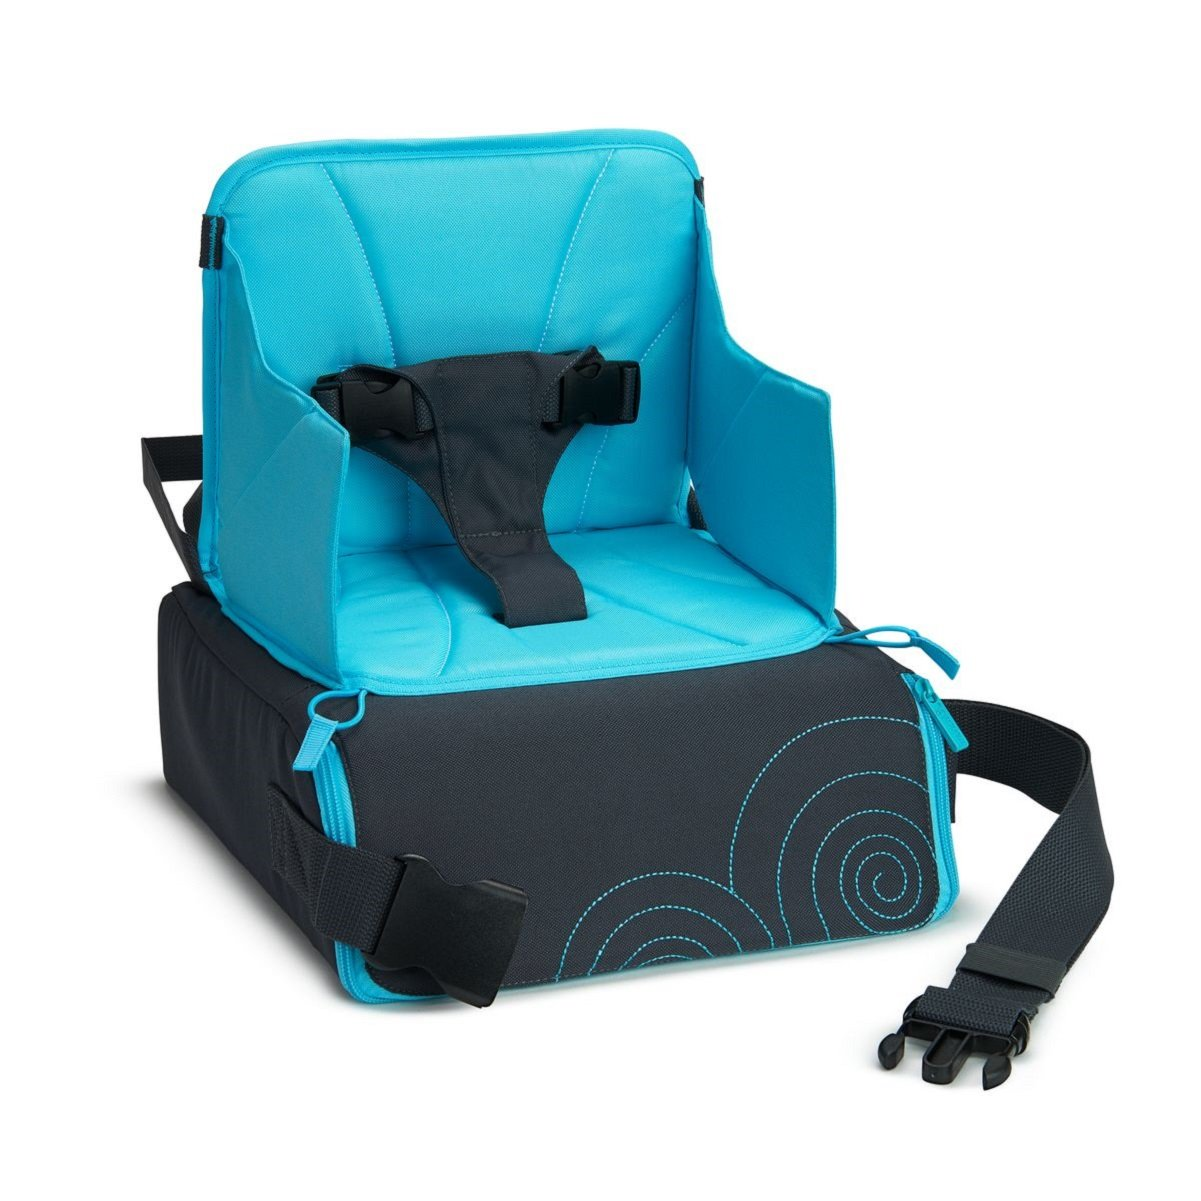 Munchkin Travel Booster Seat by Munchkin